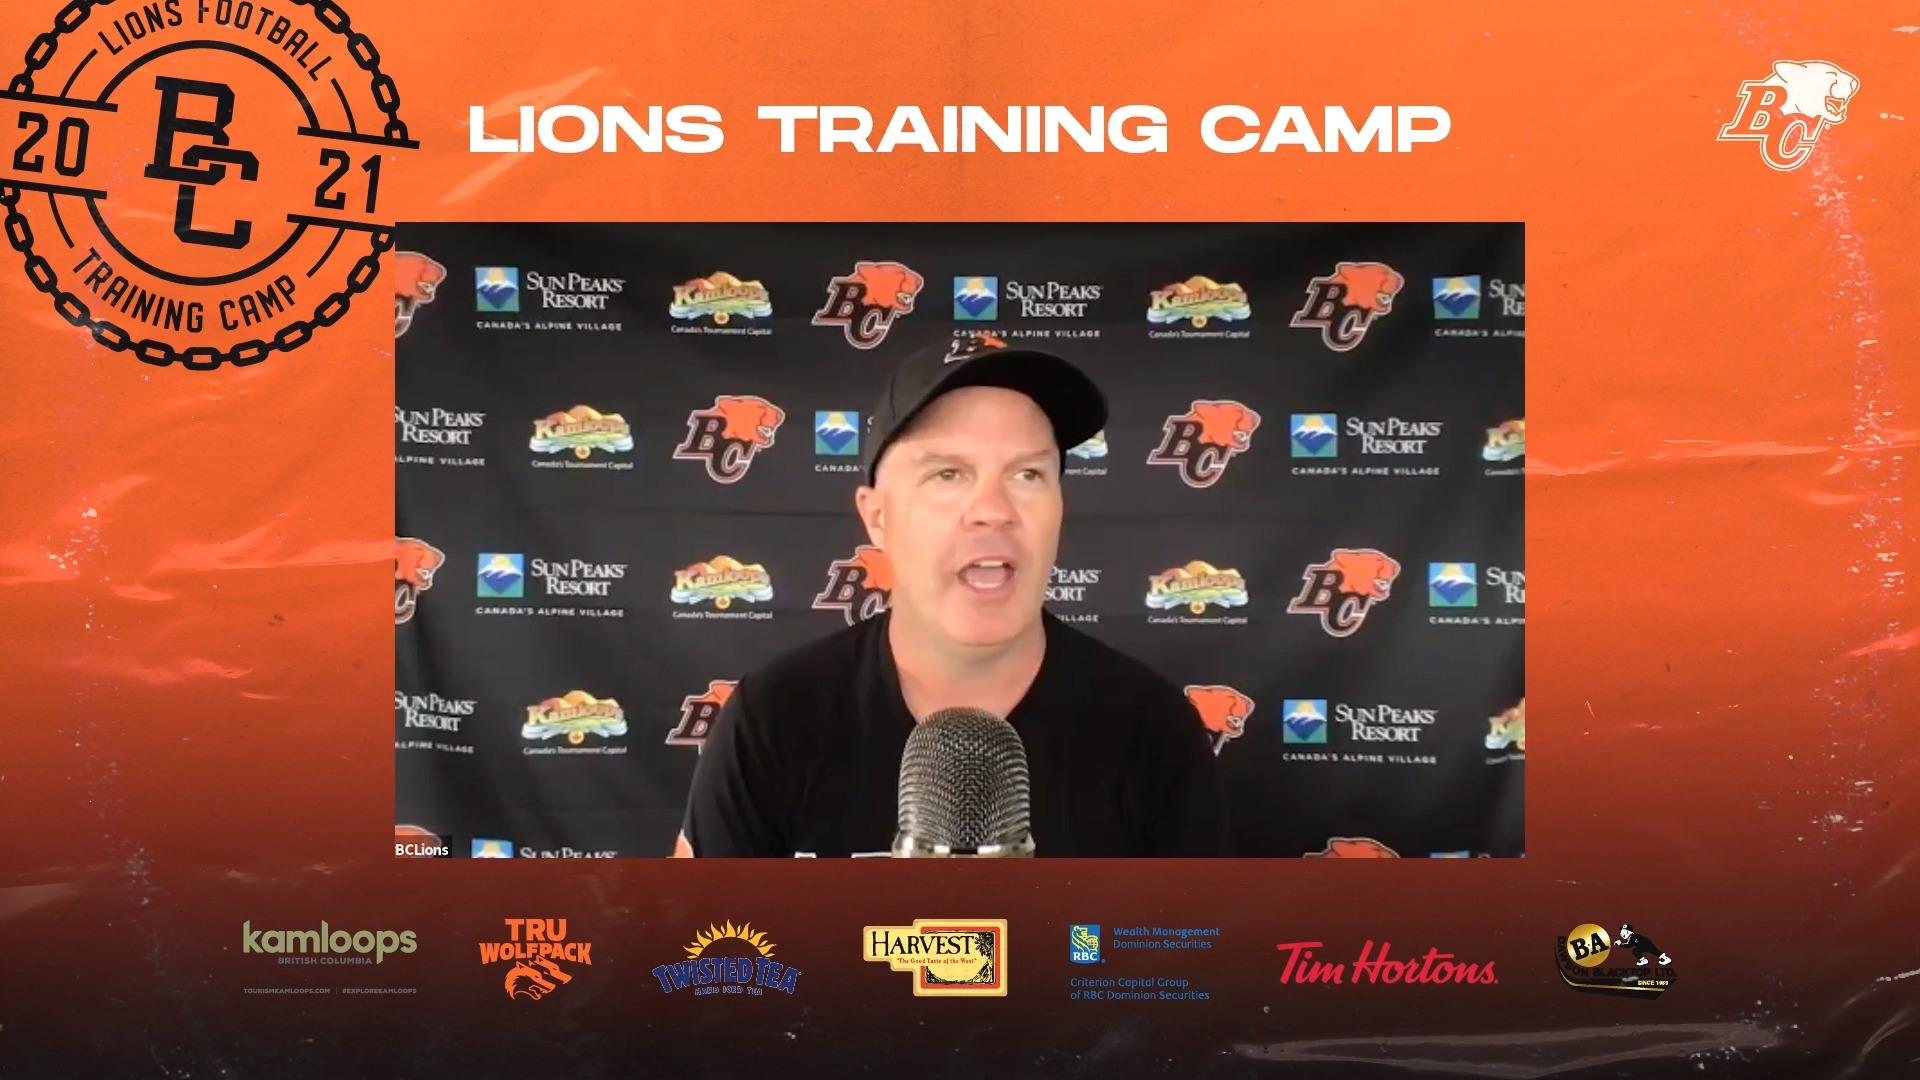 Training Camp July 22 | Rick Campbell